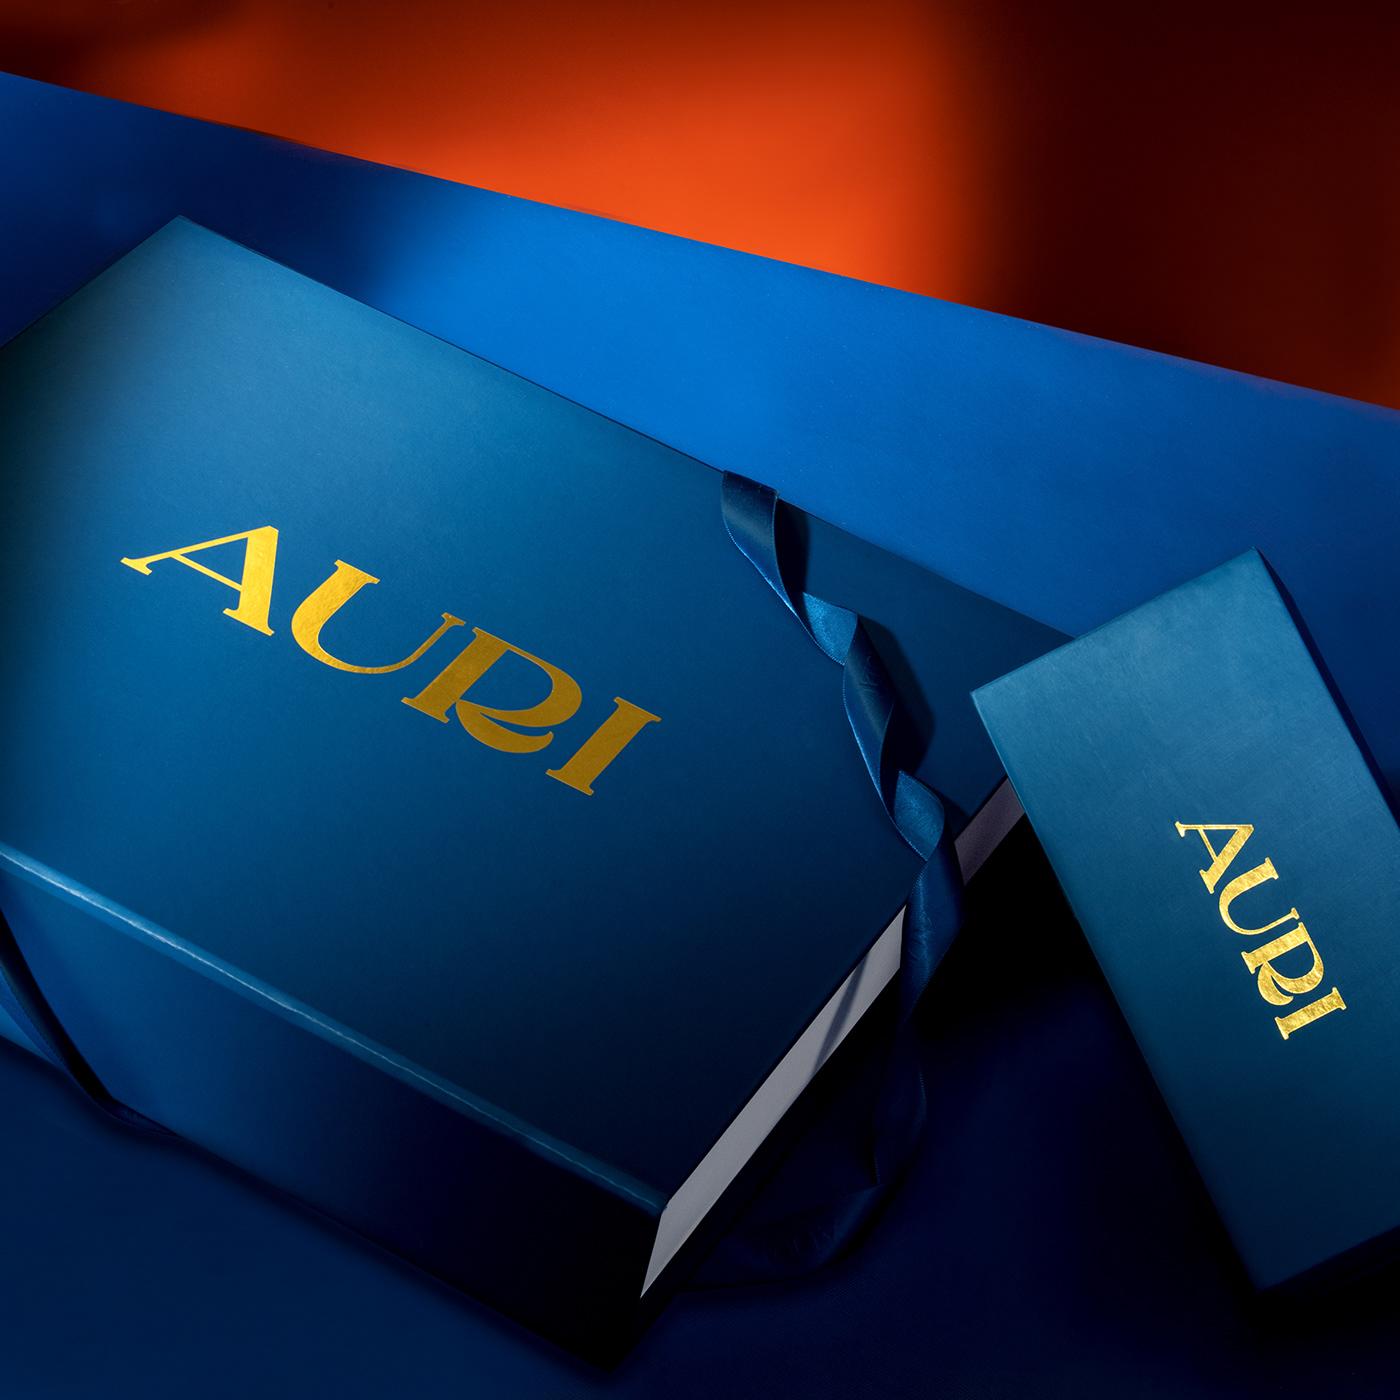 Jo Cutri Studio. Branding. Logo. Art Direction. Packaging Design. Luxury Brands. India. Home Decor